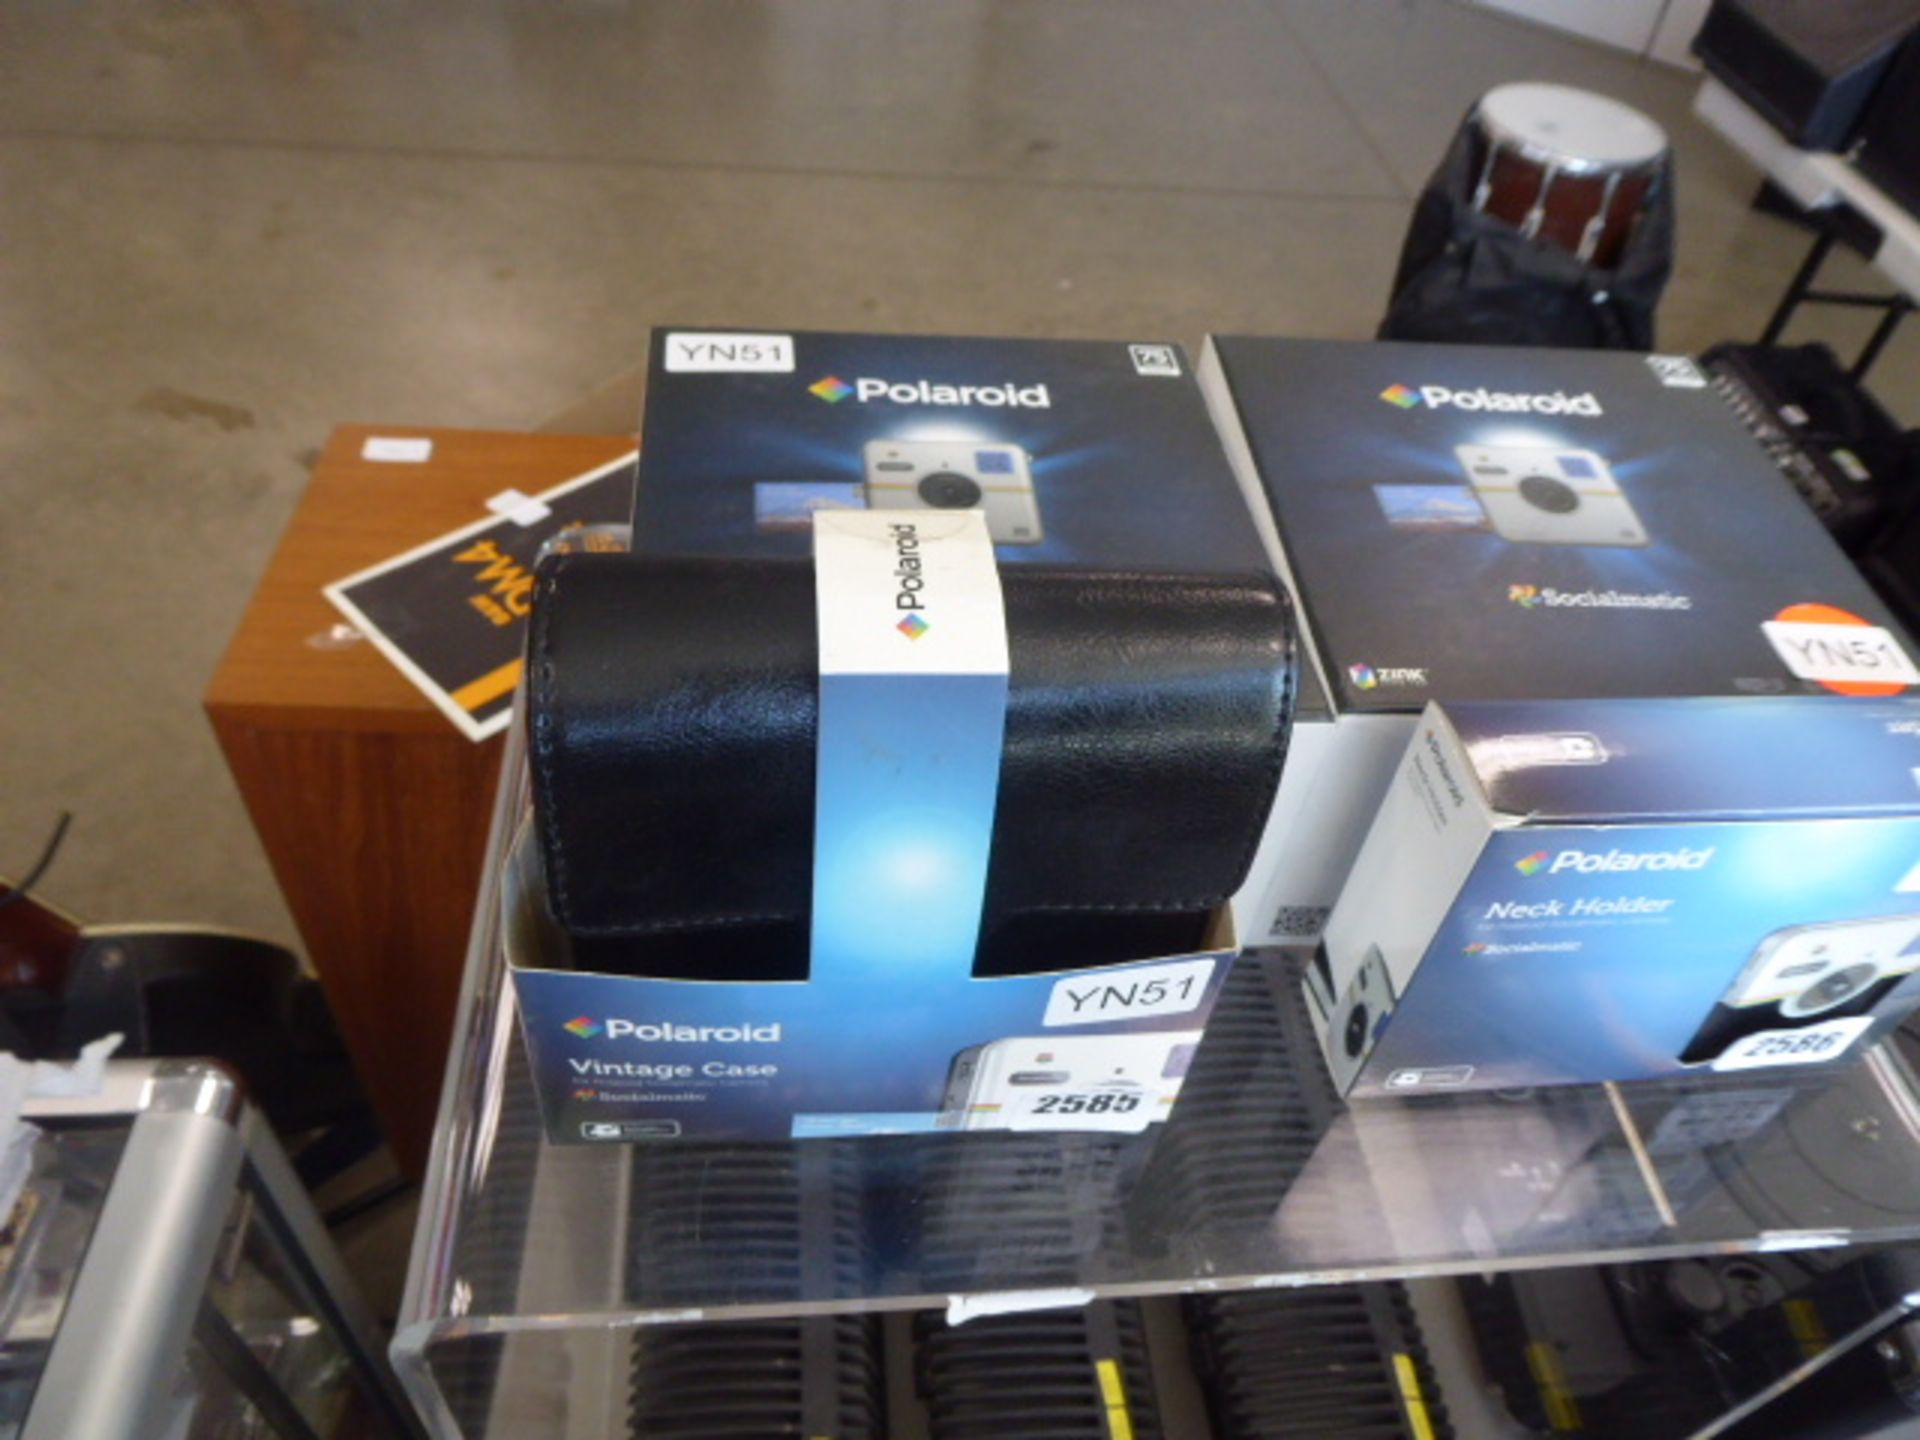 Lot 2585 - 2578 Polaroid Sociamatic camera with vintage case